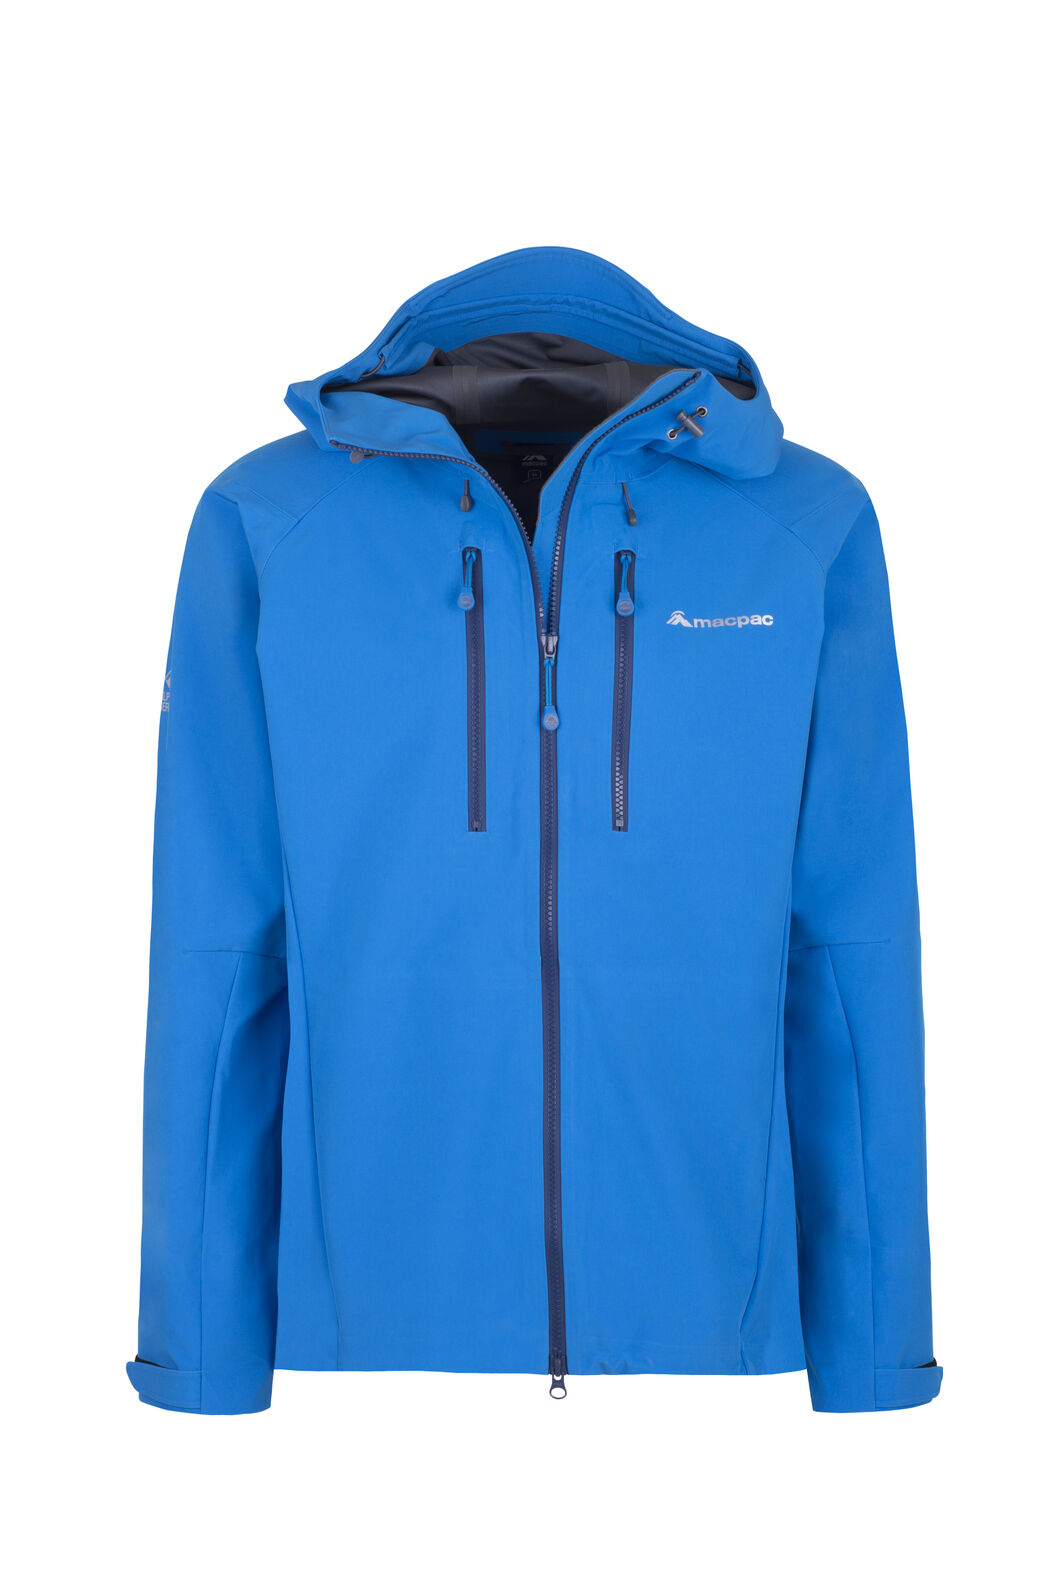 Macpac Fitzroy Alpine Series Softshell Jacket - Men's, Directoire, hi-res